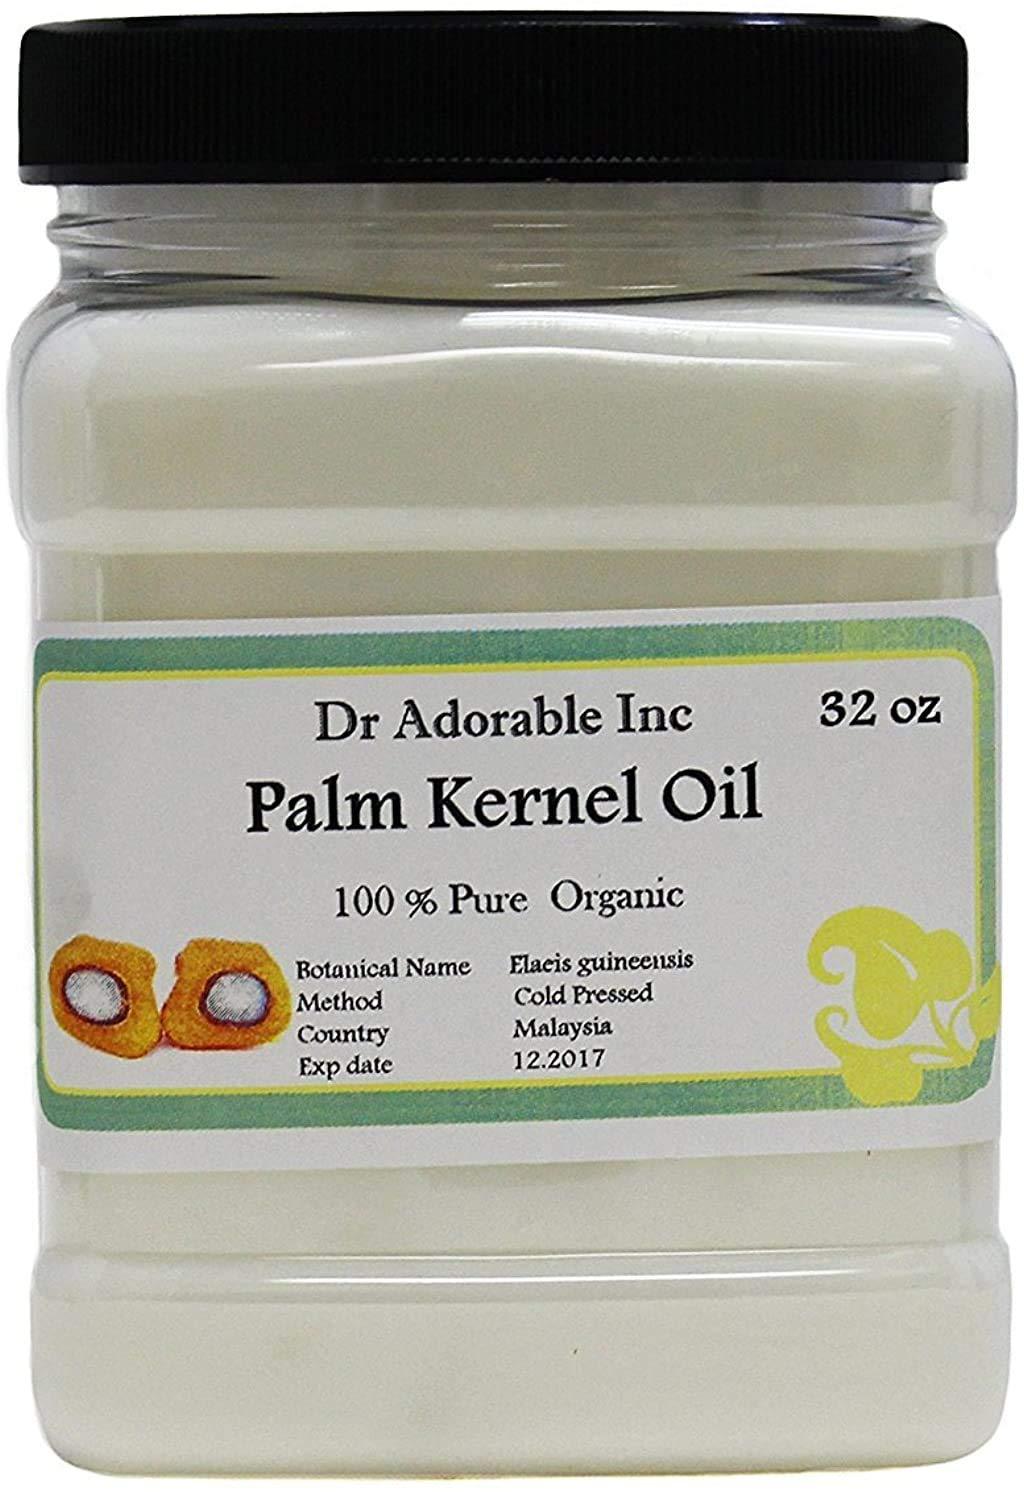 Palm Kernel Oil Pure Cold Pressed Organic 32 Oz / 1 Quart